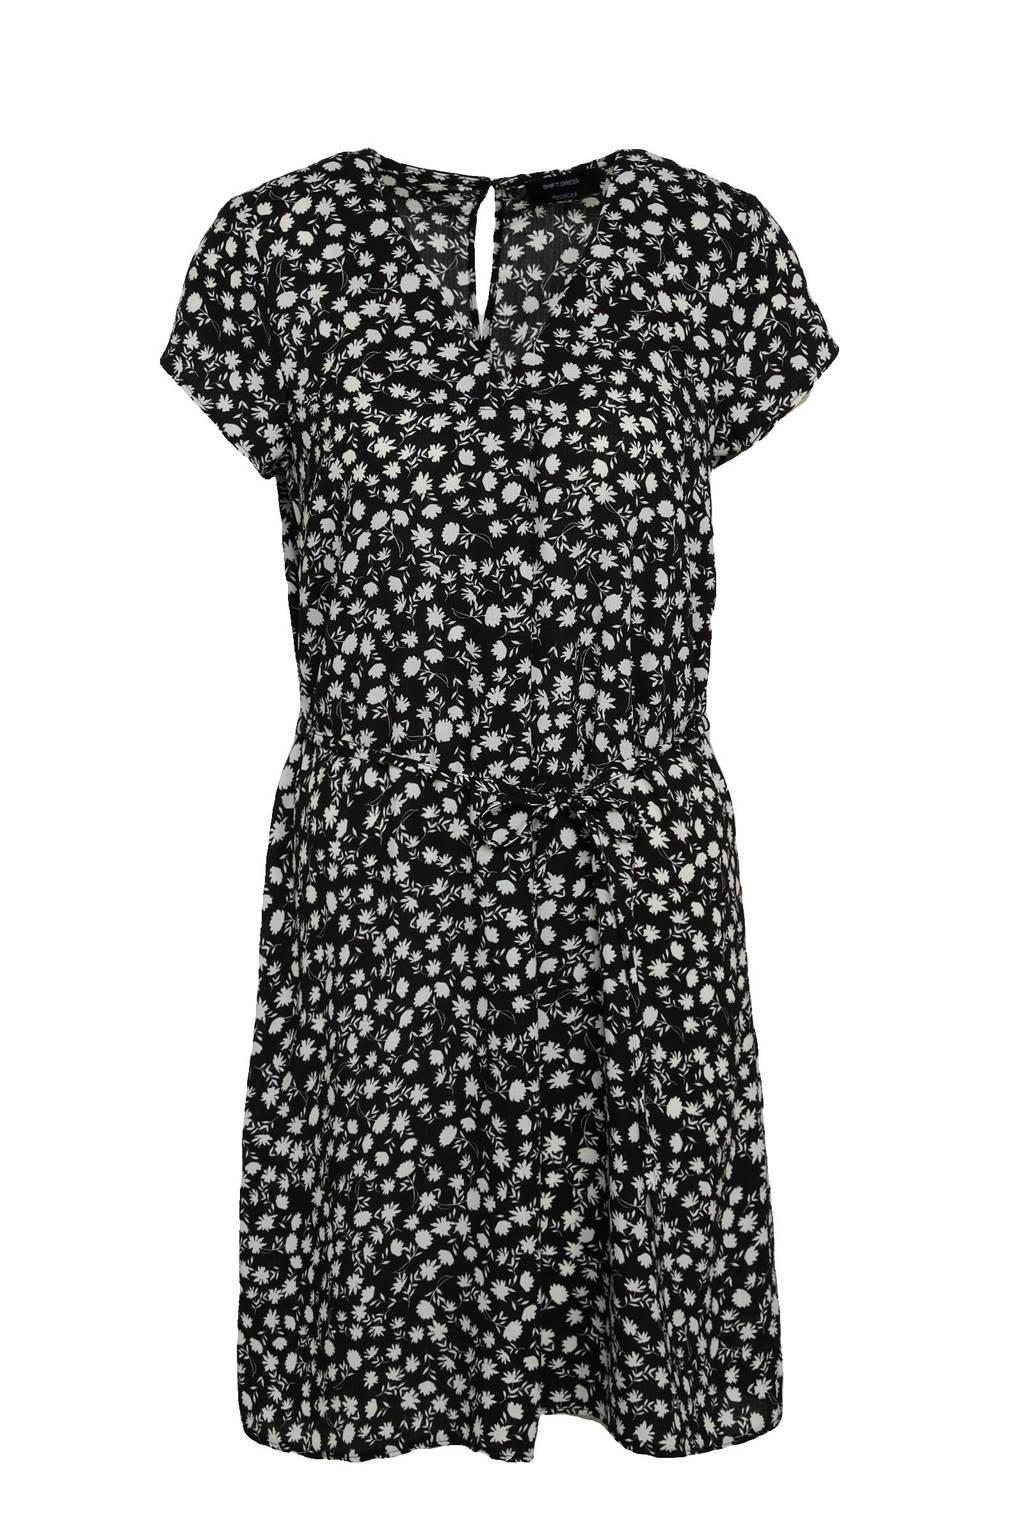 C&A Yessica jurk met all over print en plooien zwart, Zwart